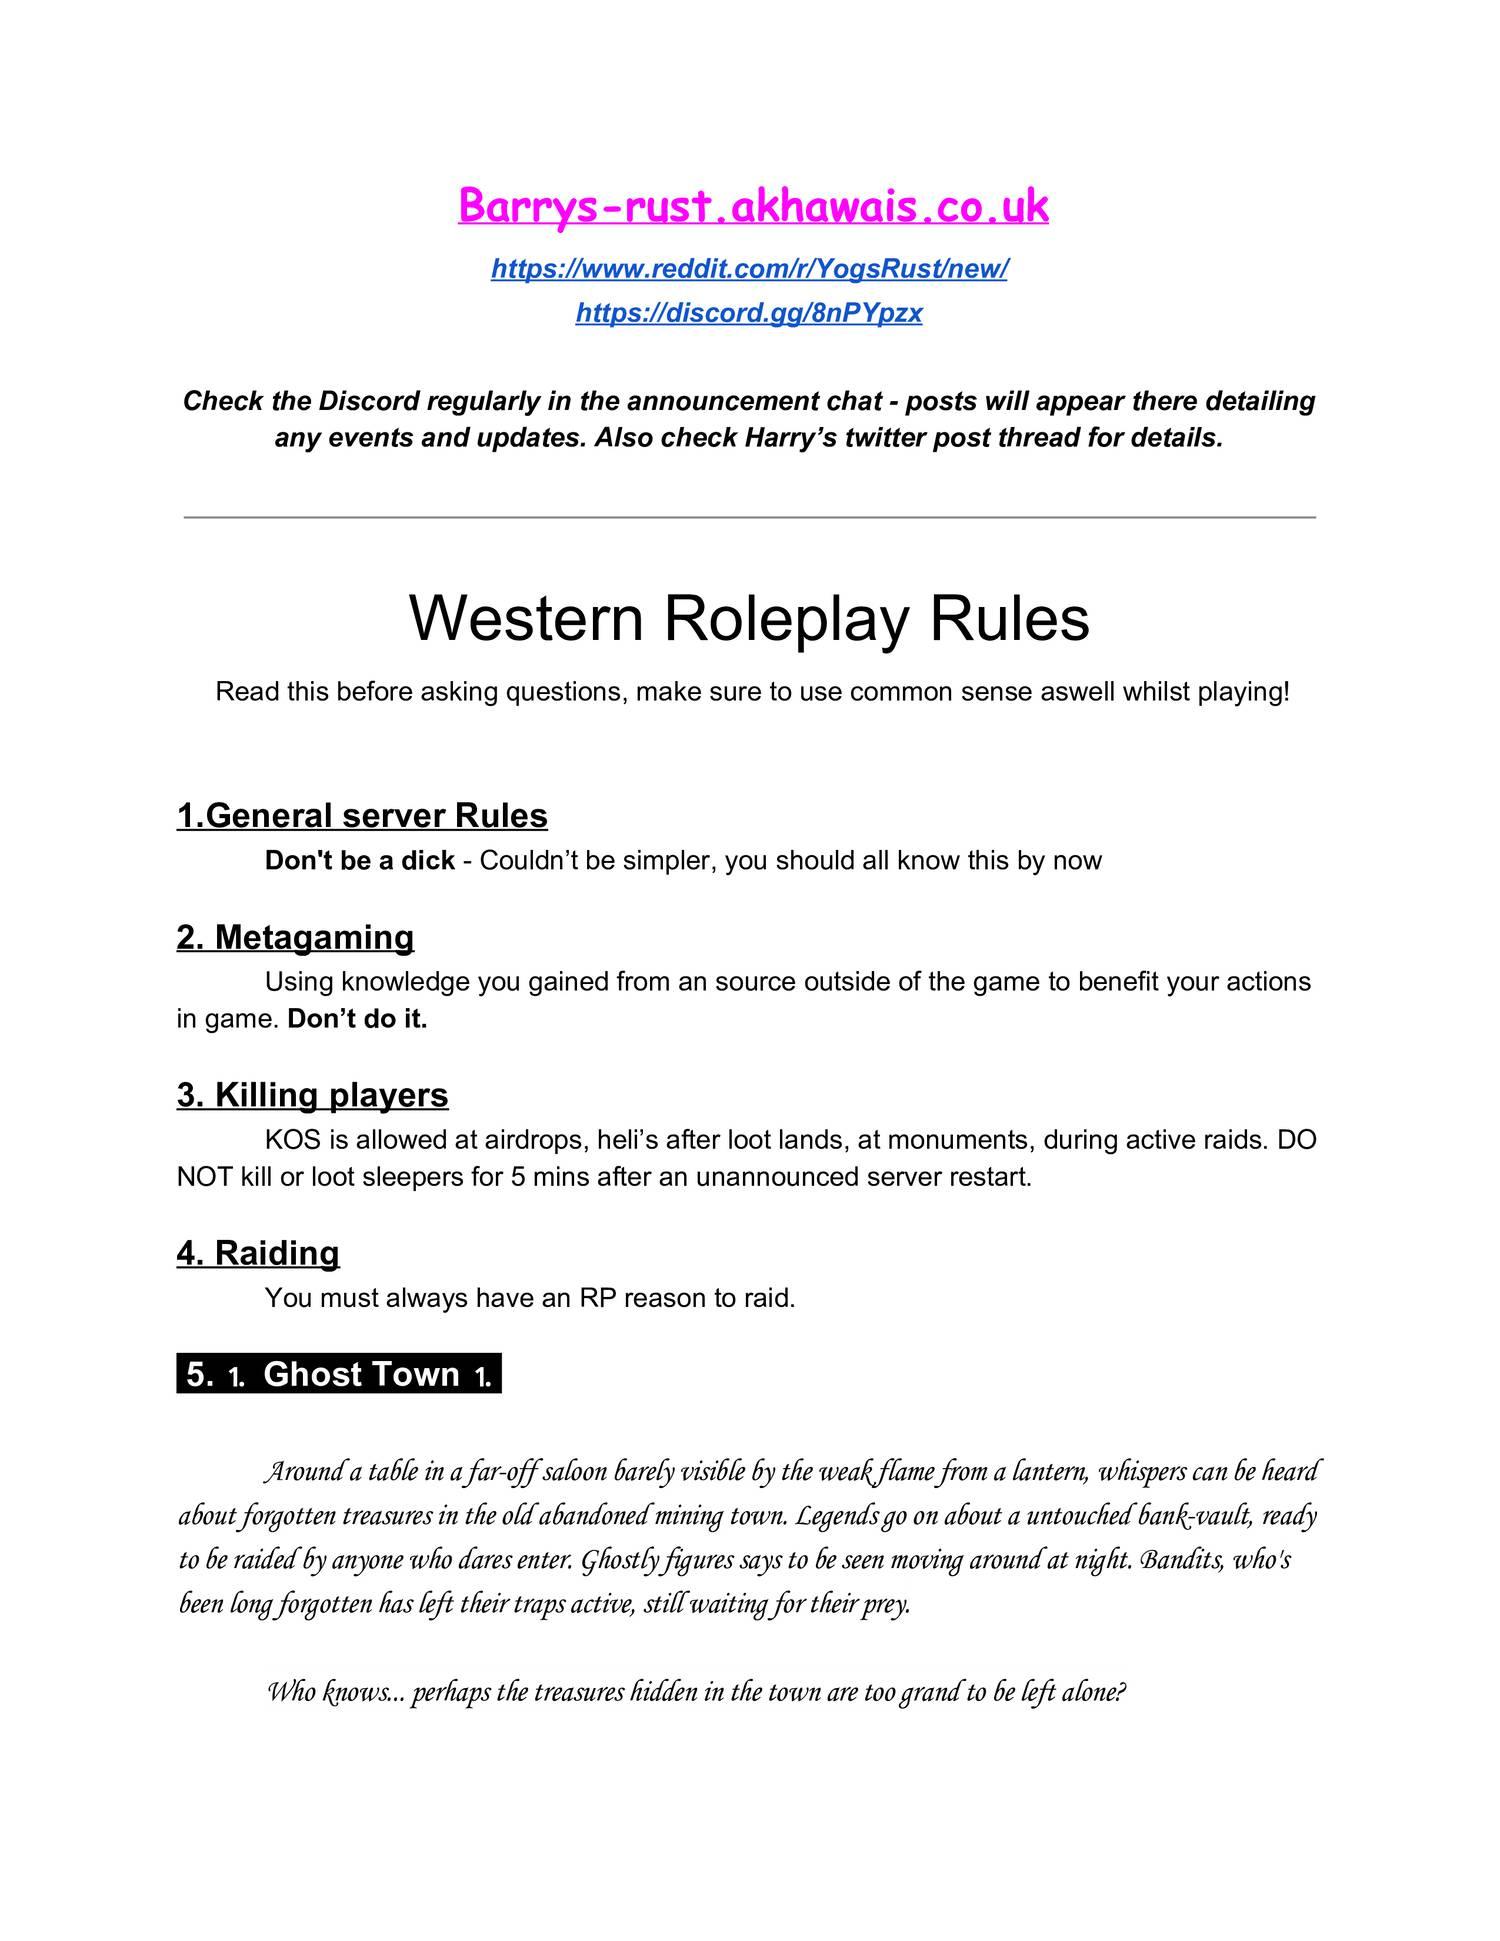 WesternThemedRPRules(1) pdf | DocDroid